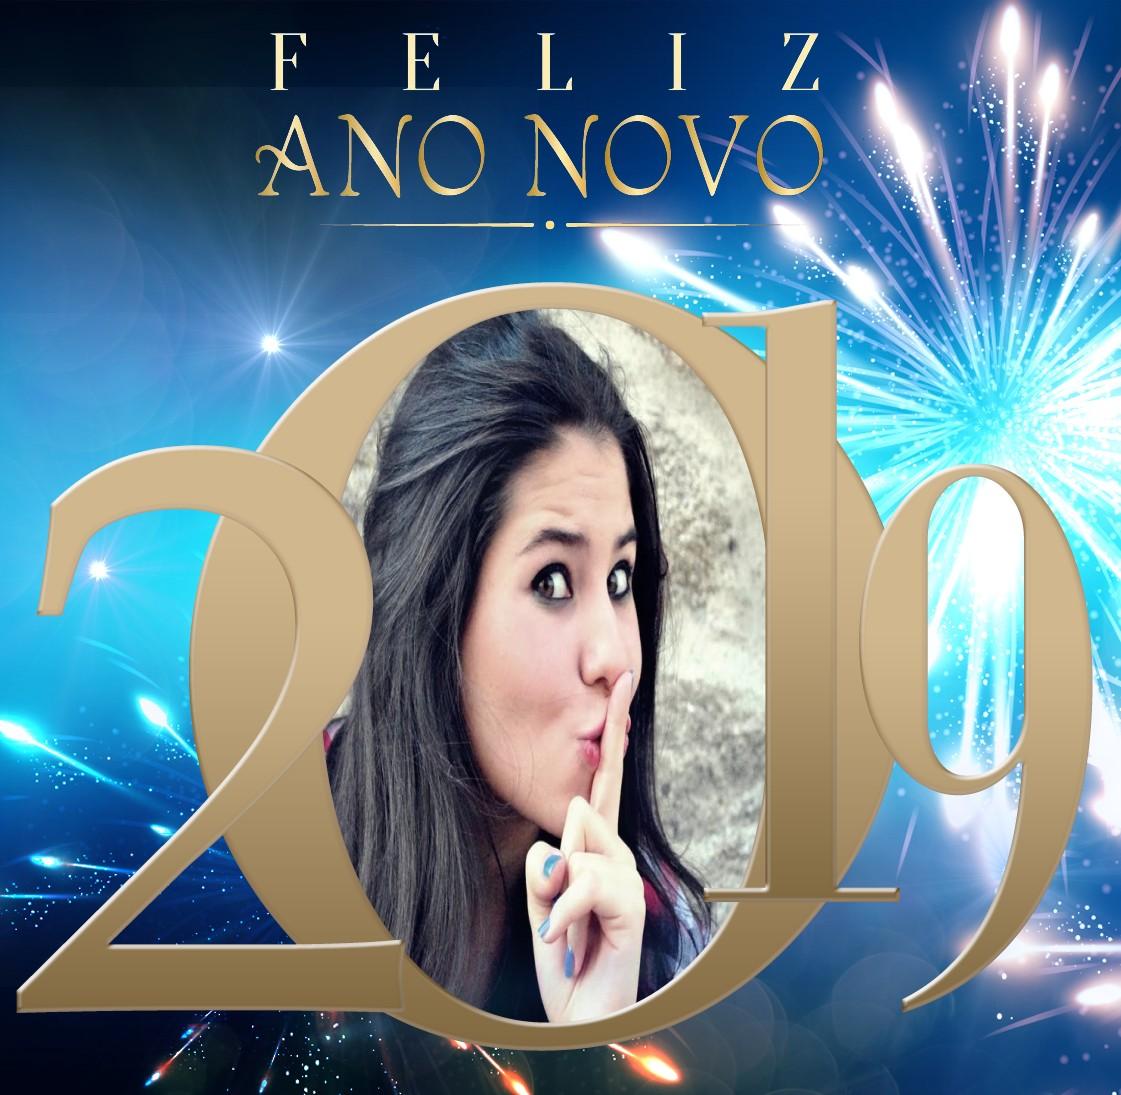 moldura-para-foto-feliz-ano-novo-2019